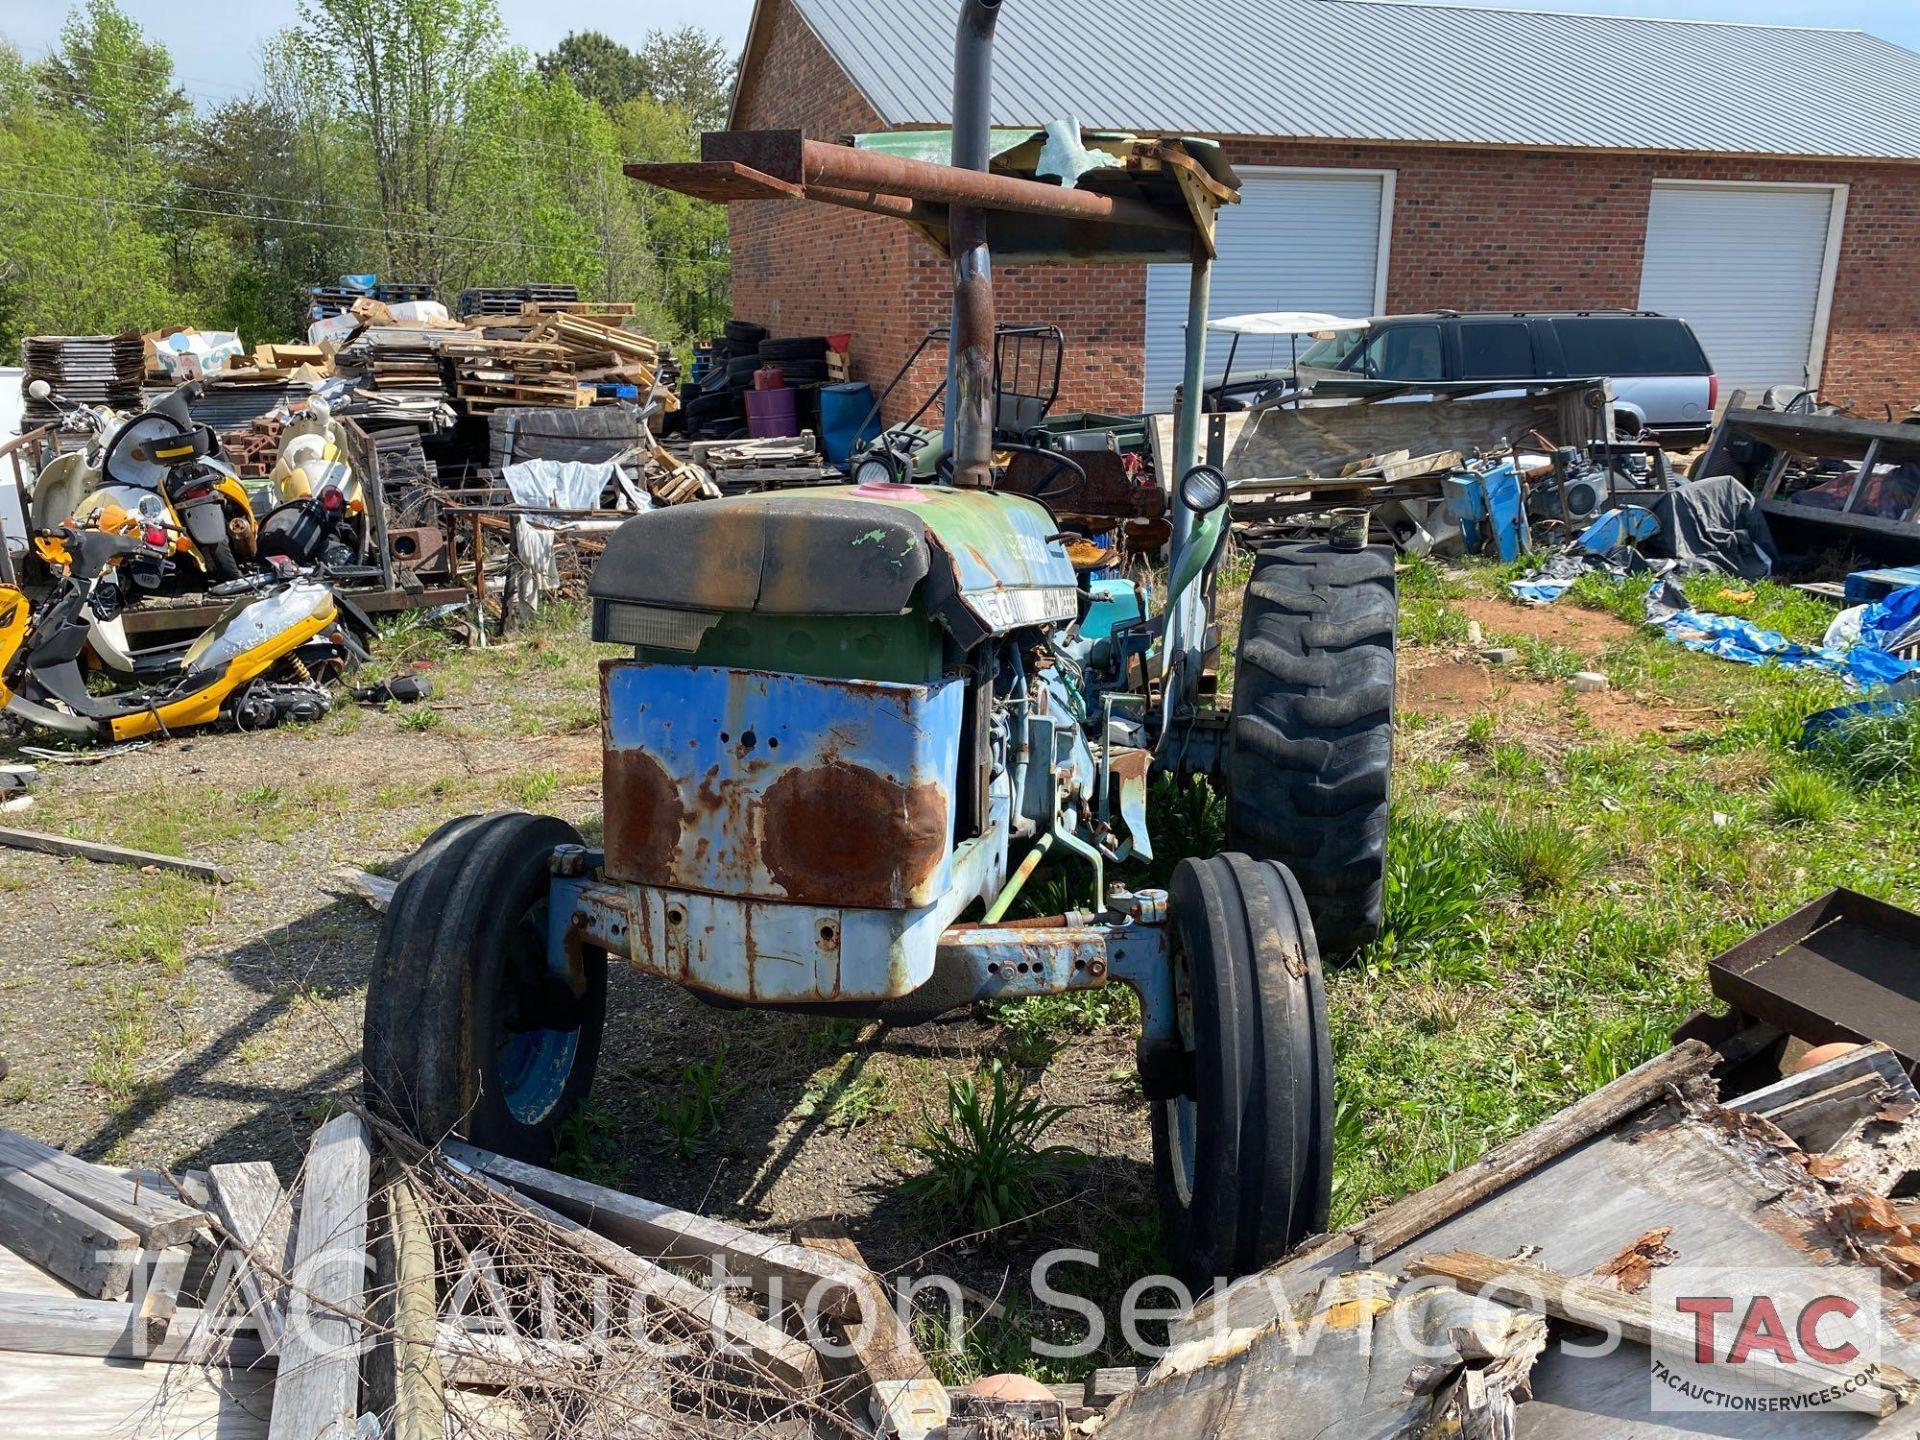 John Deere 2150 Farm Tractor - Image 22 of 34